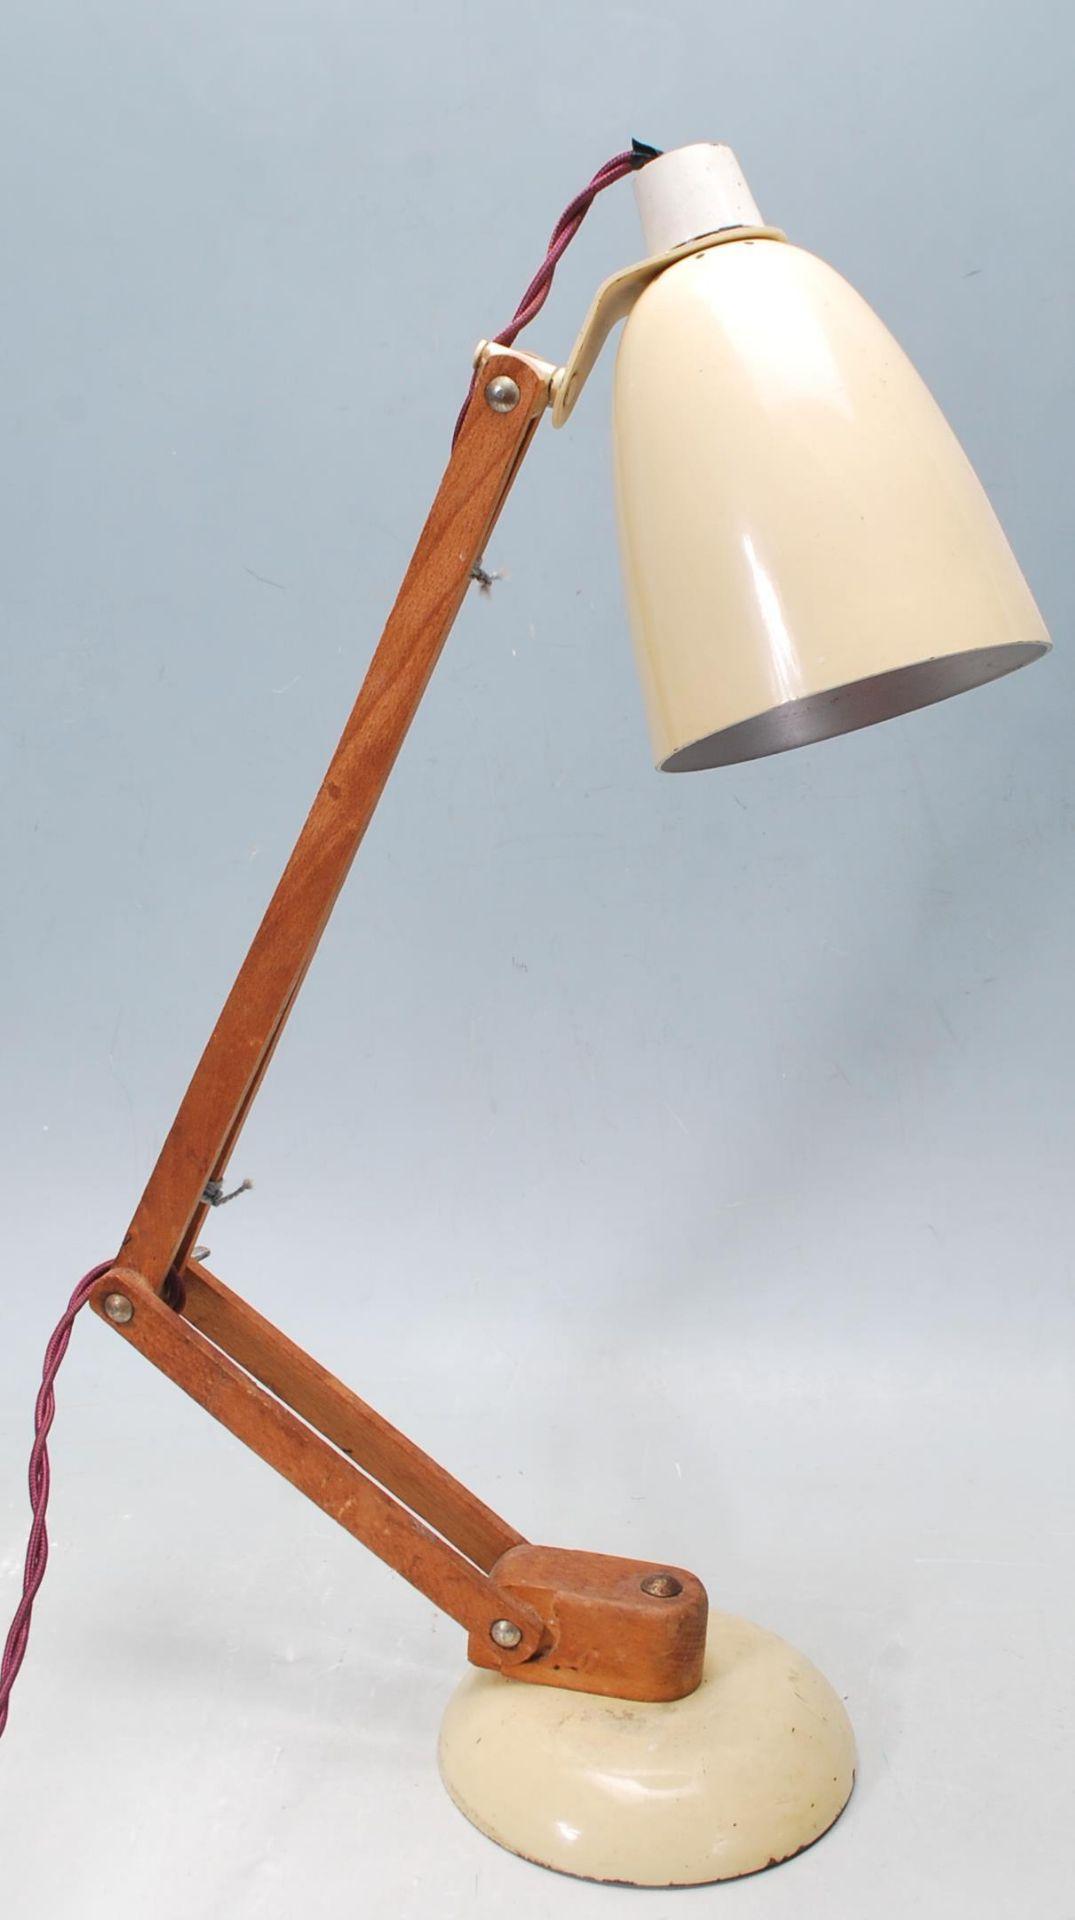 MID CENTURY TERENCE CONRAN MACLAMP DESK LAMP - Image 6 of 7